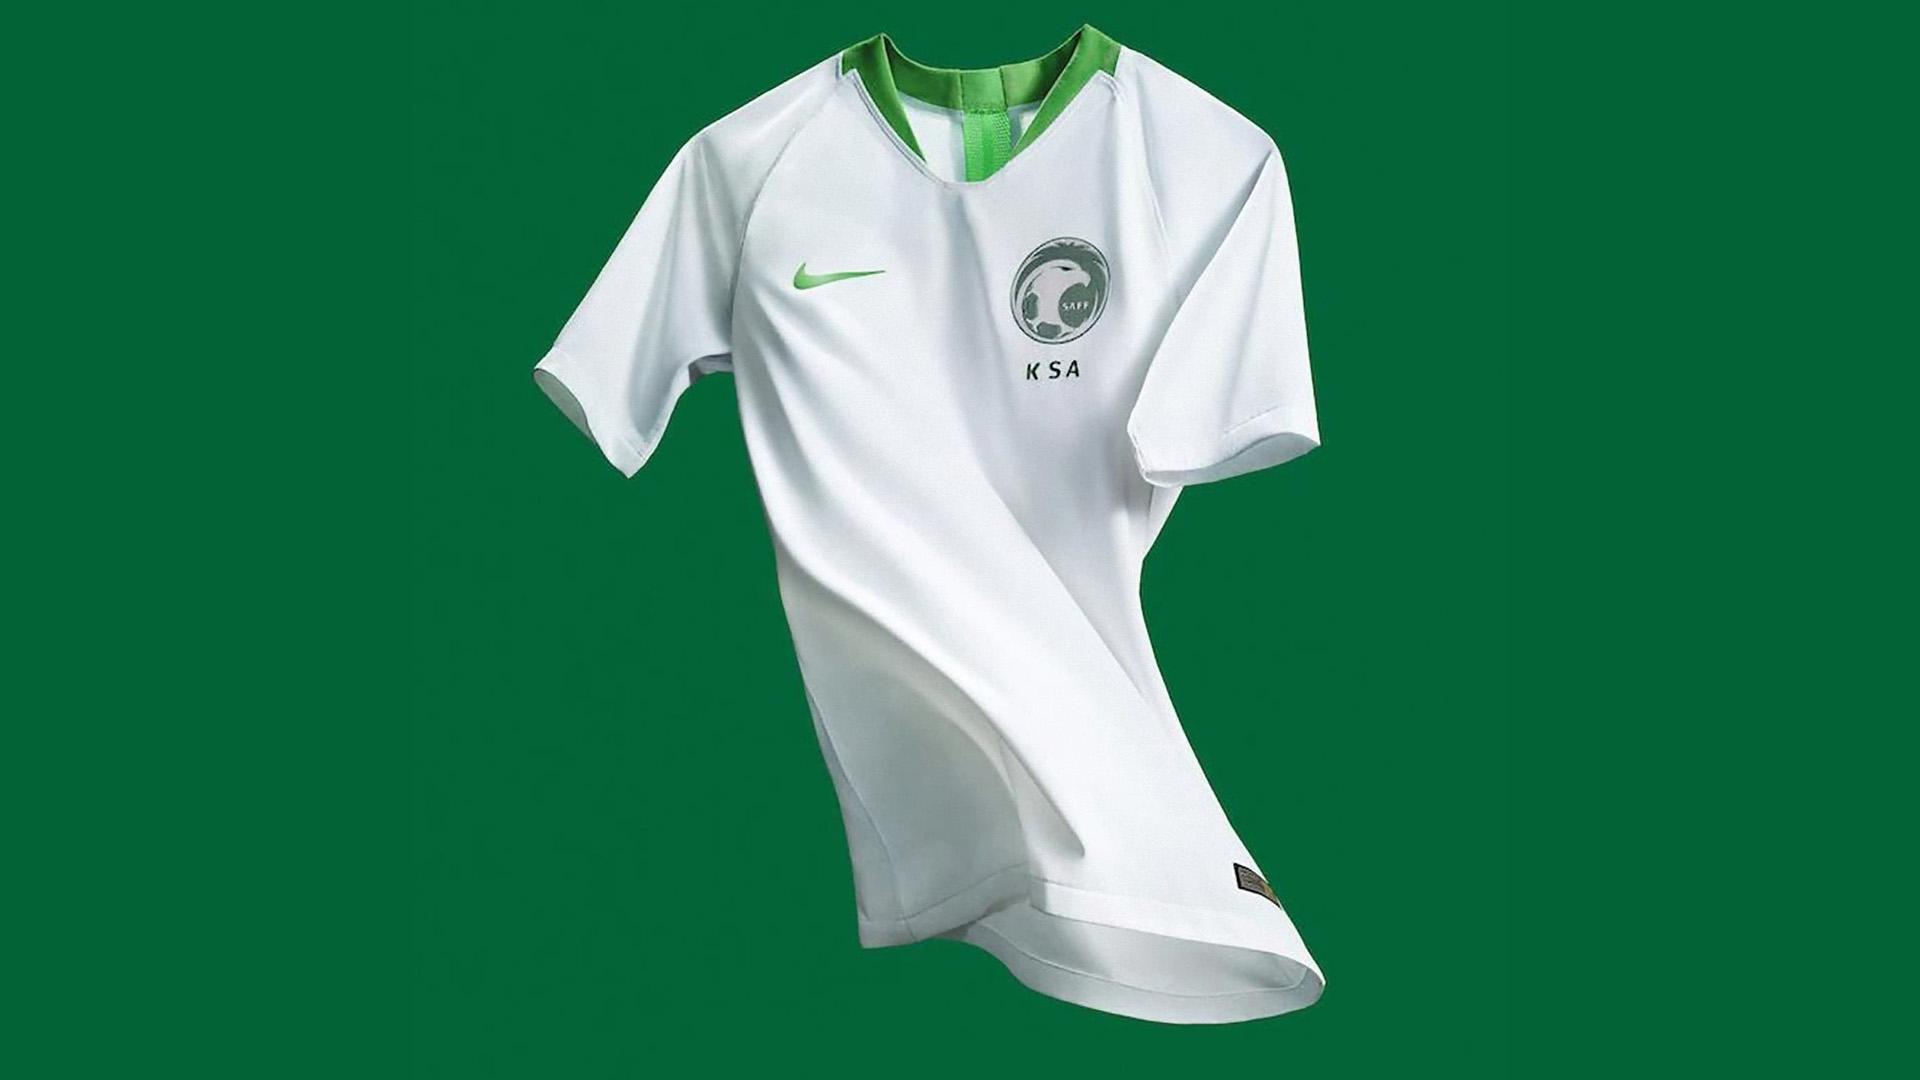 Arabia Saudita Camiseta Titular Saudi Arabia Home Kit 2018 dcf8b287814df